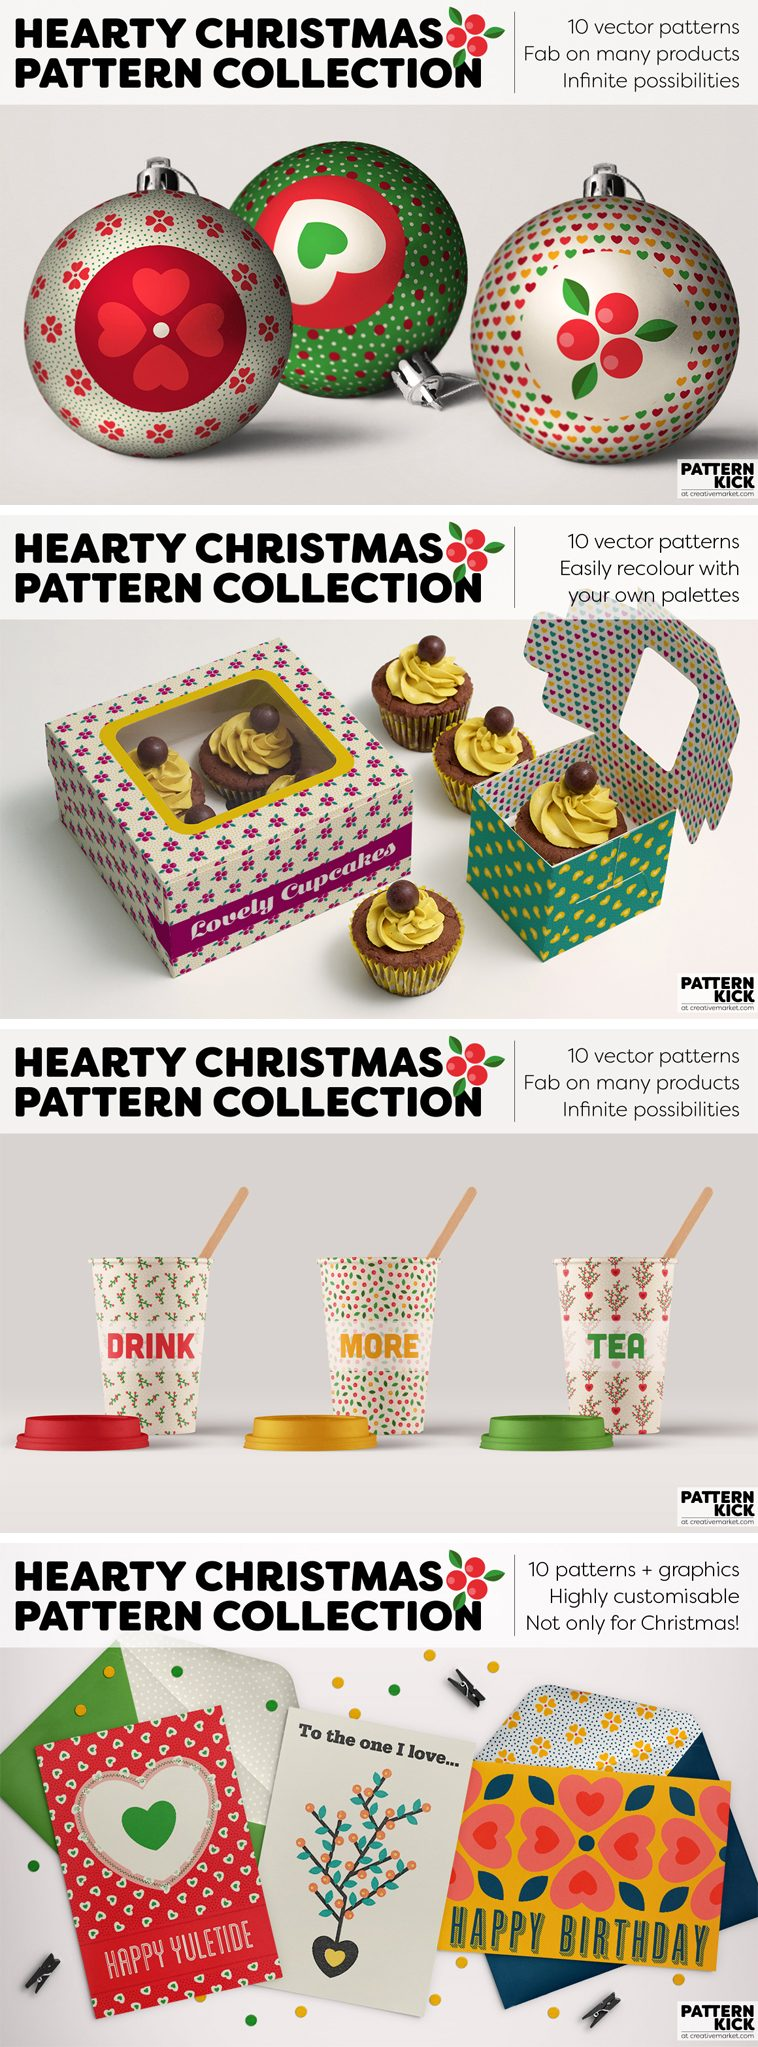 Christmas Prints and Patterns at Pattern Kick - Creative Market [2] | Pitter Pattern